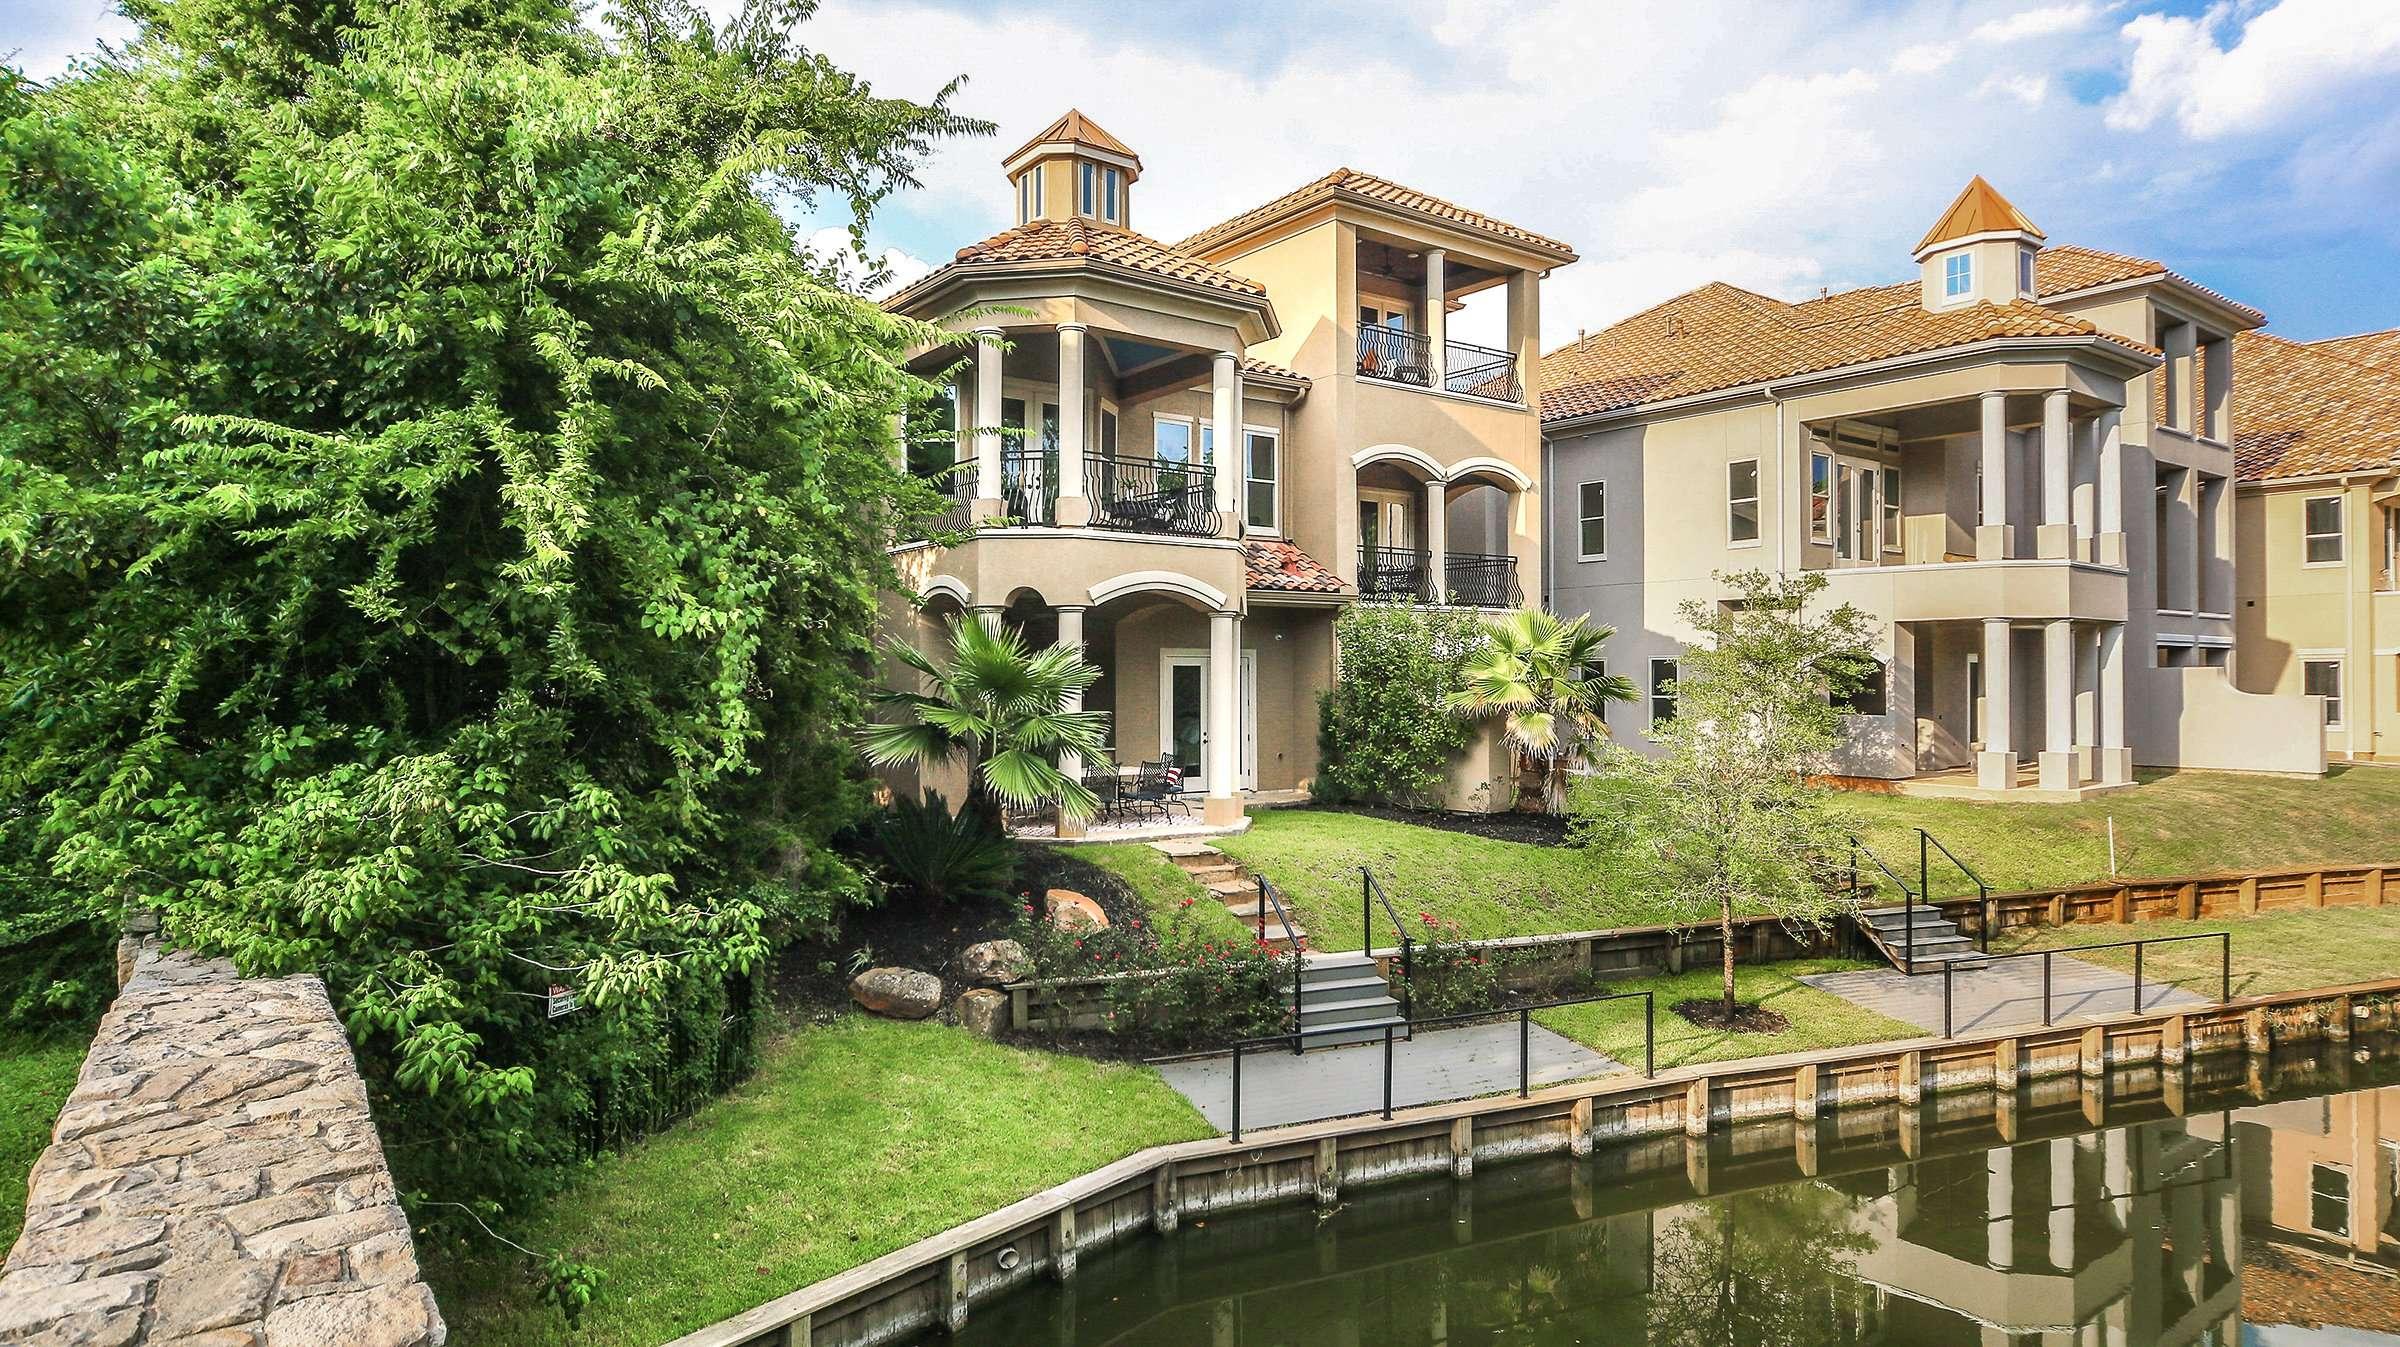 The Moderne Rentals - Scottsdale, AZ   Apartments.com